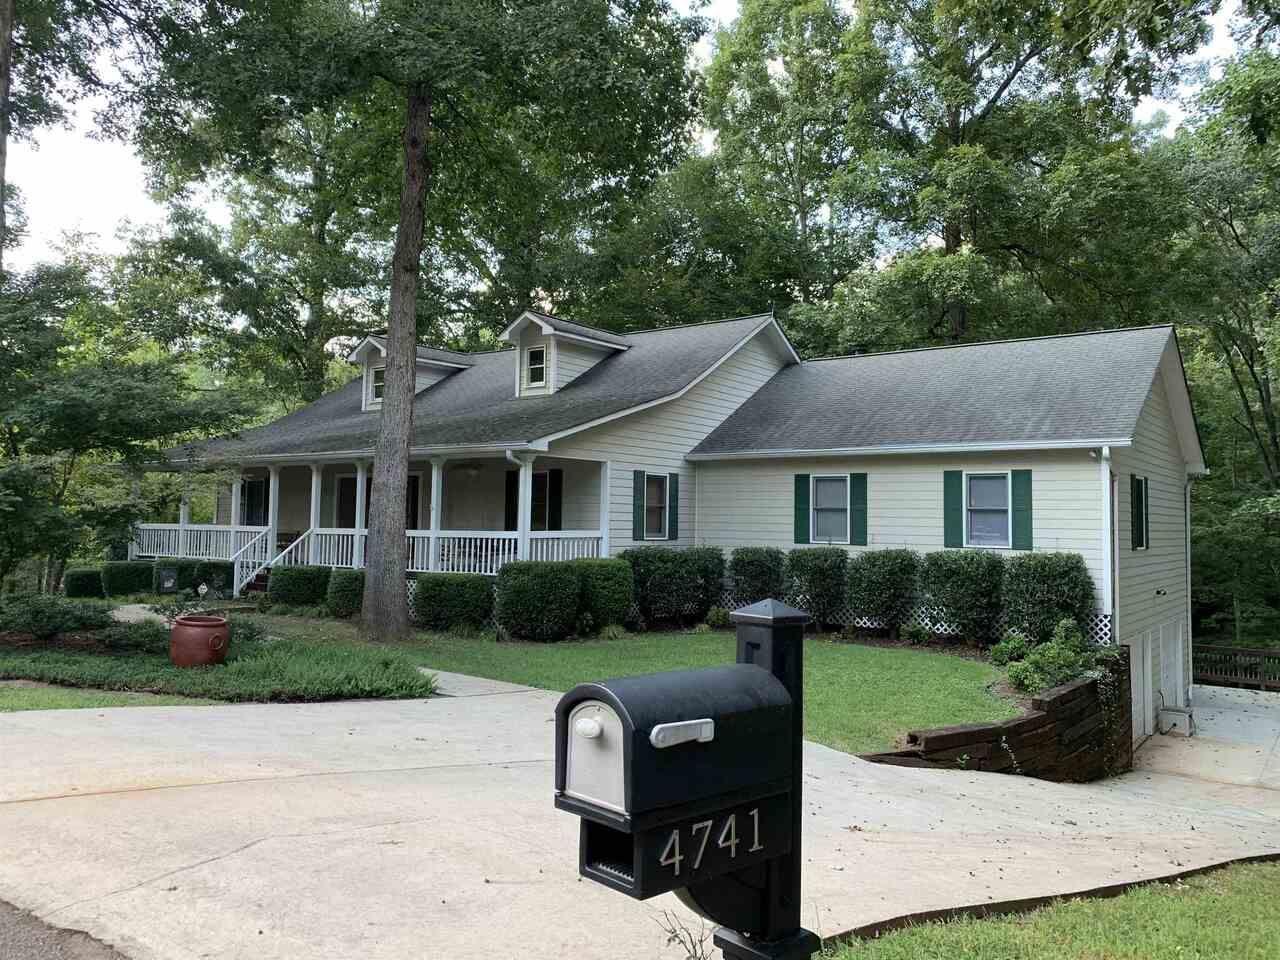 4741 Walnut Bend Drive, Gainesville, GA 30507 - MLS#: 9044123